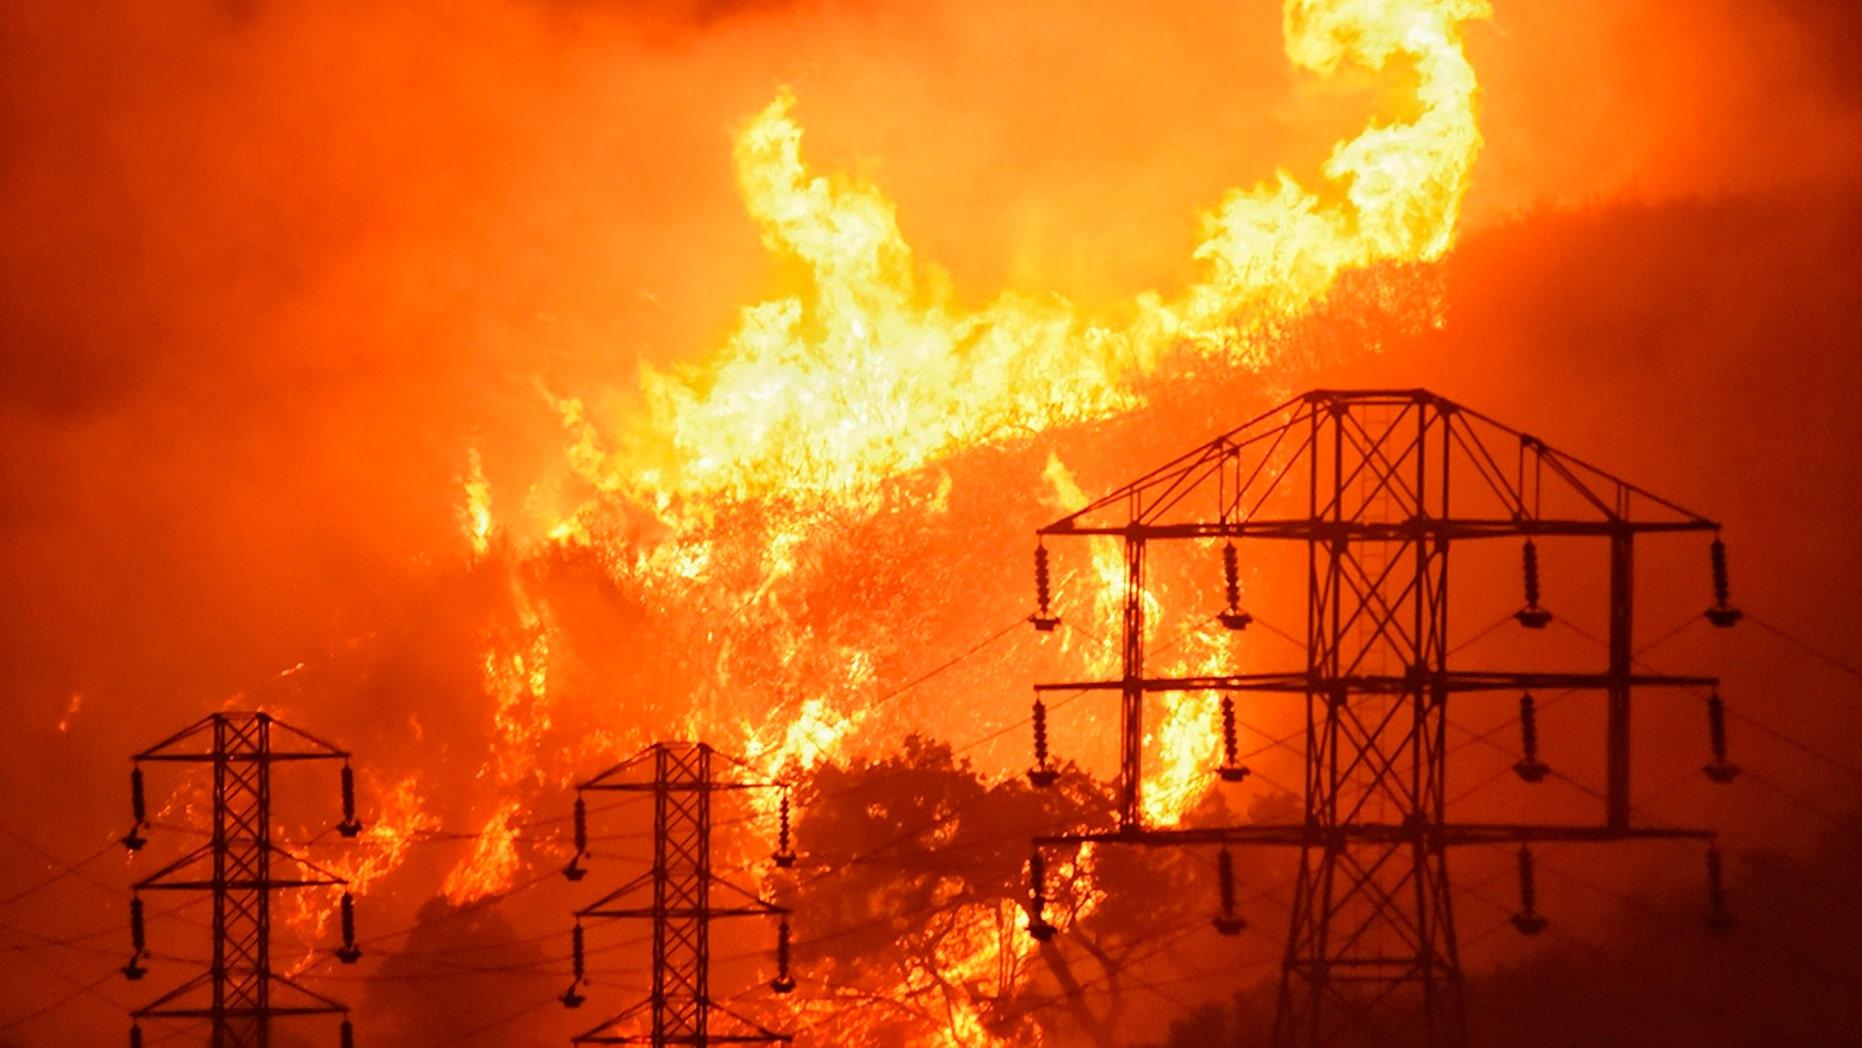 FILE -Flames burn near power lines in Montecito, Calif., Dec. 16, 2017. (Mike Eliason/Santa Barbara County Fire Department via AP)